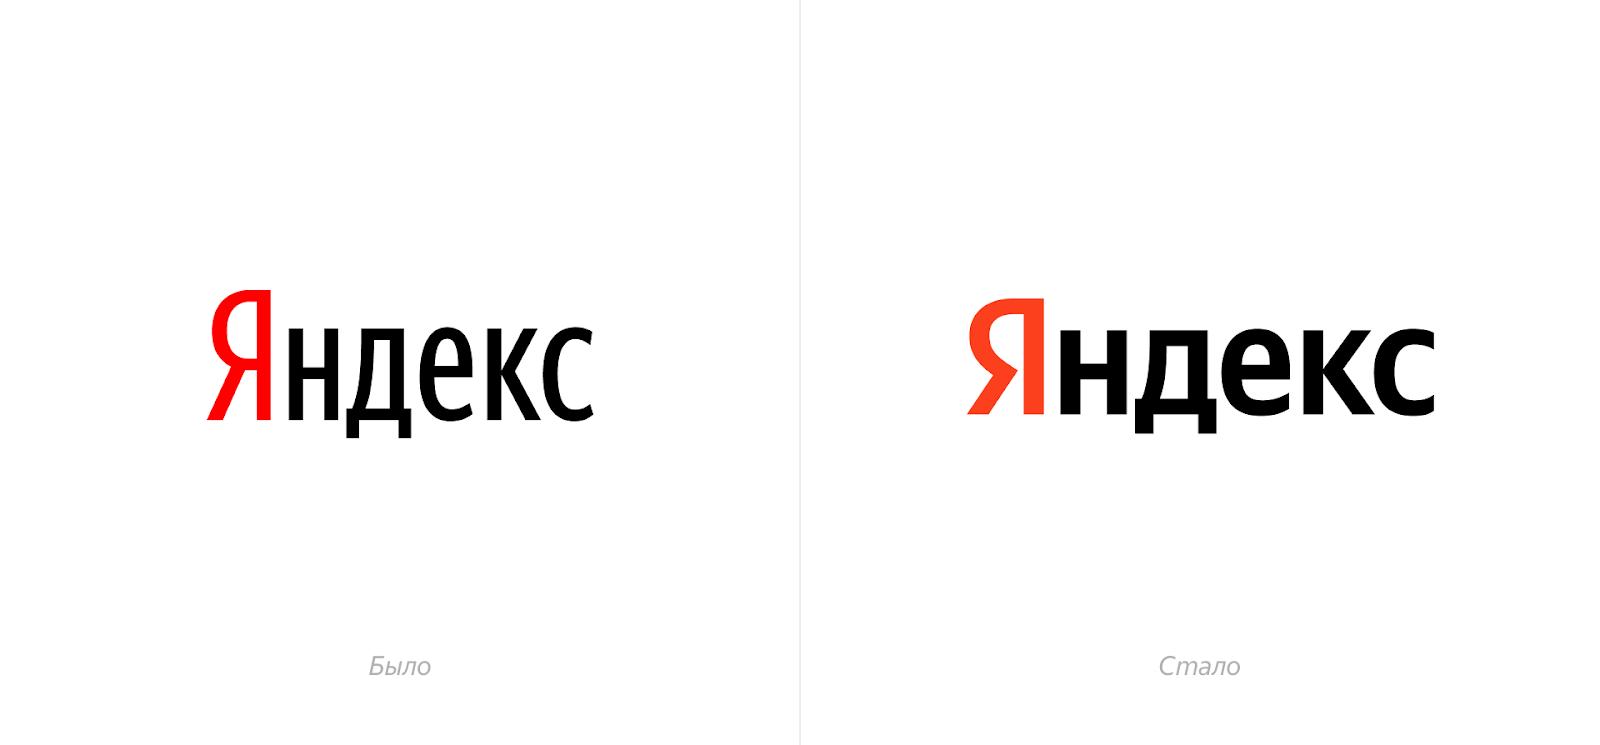 «Яндекс» сменил логотип - Новости – Hi-Tech – Коммерсантъ